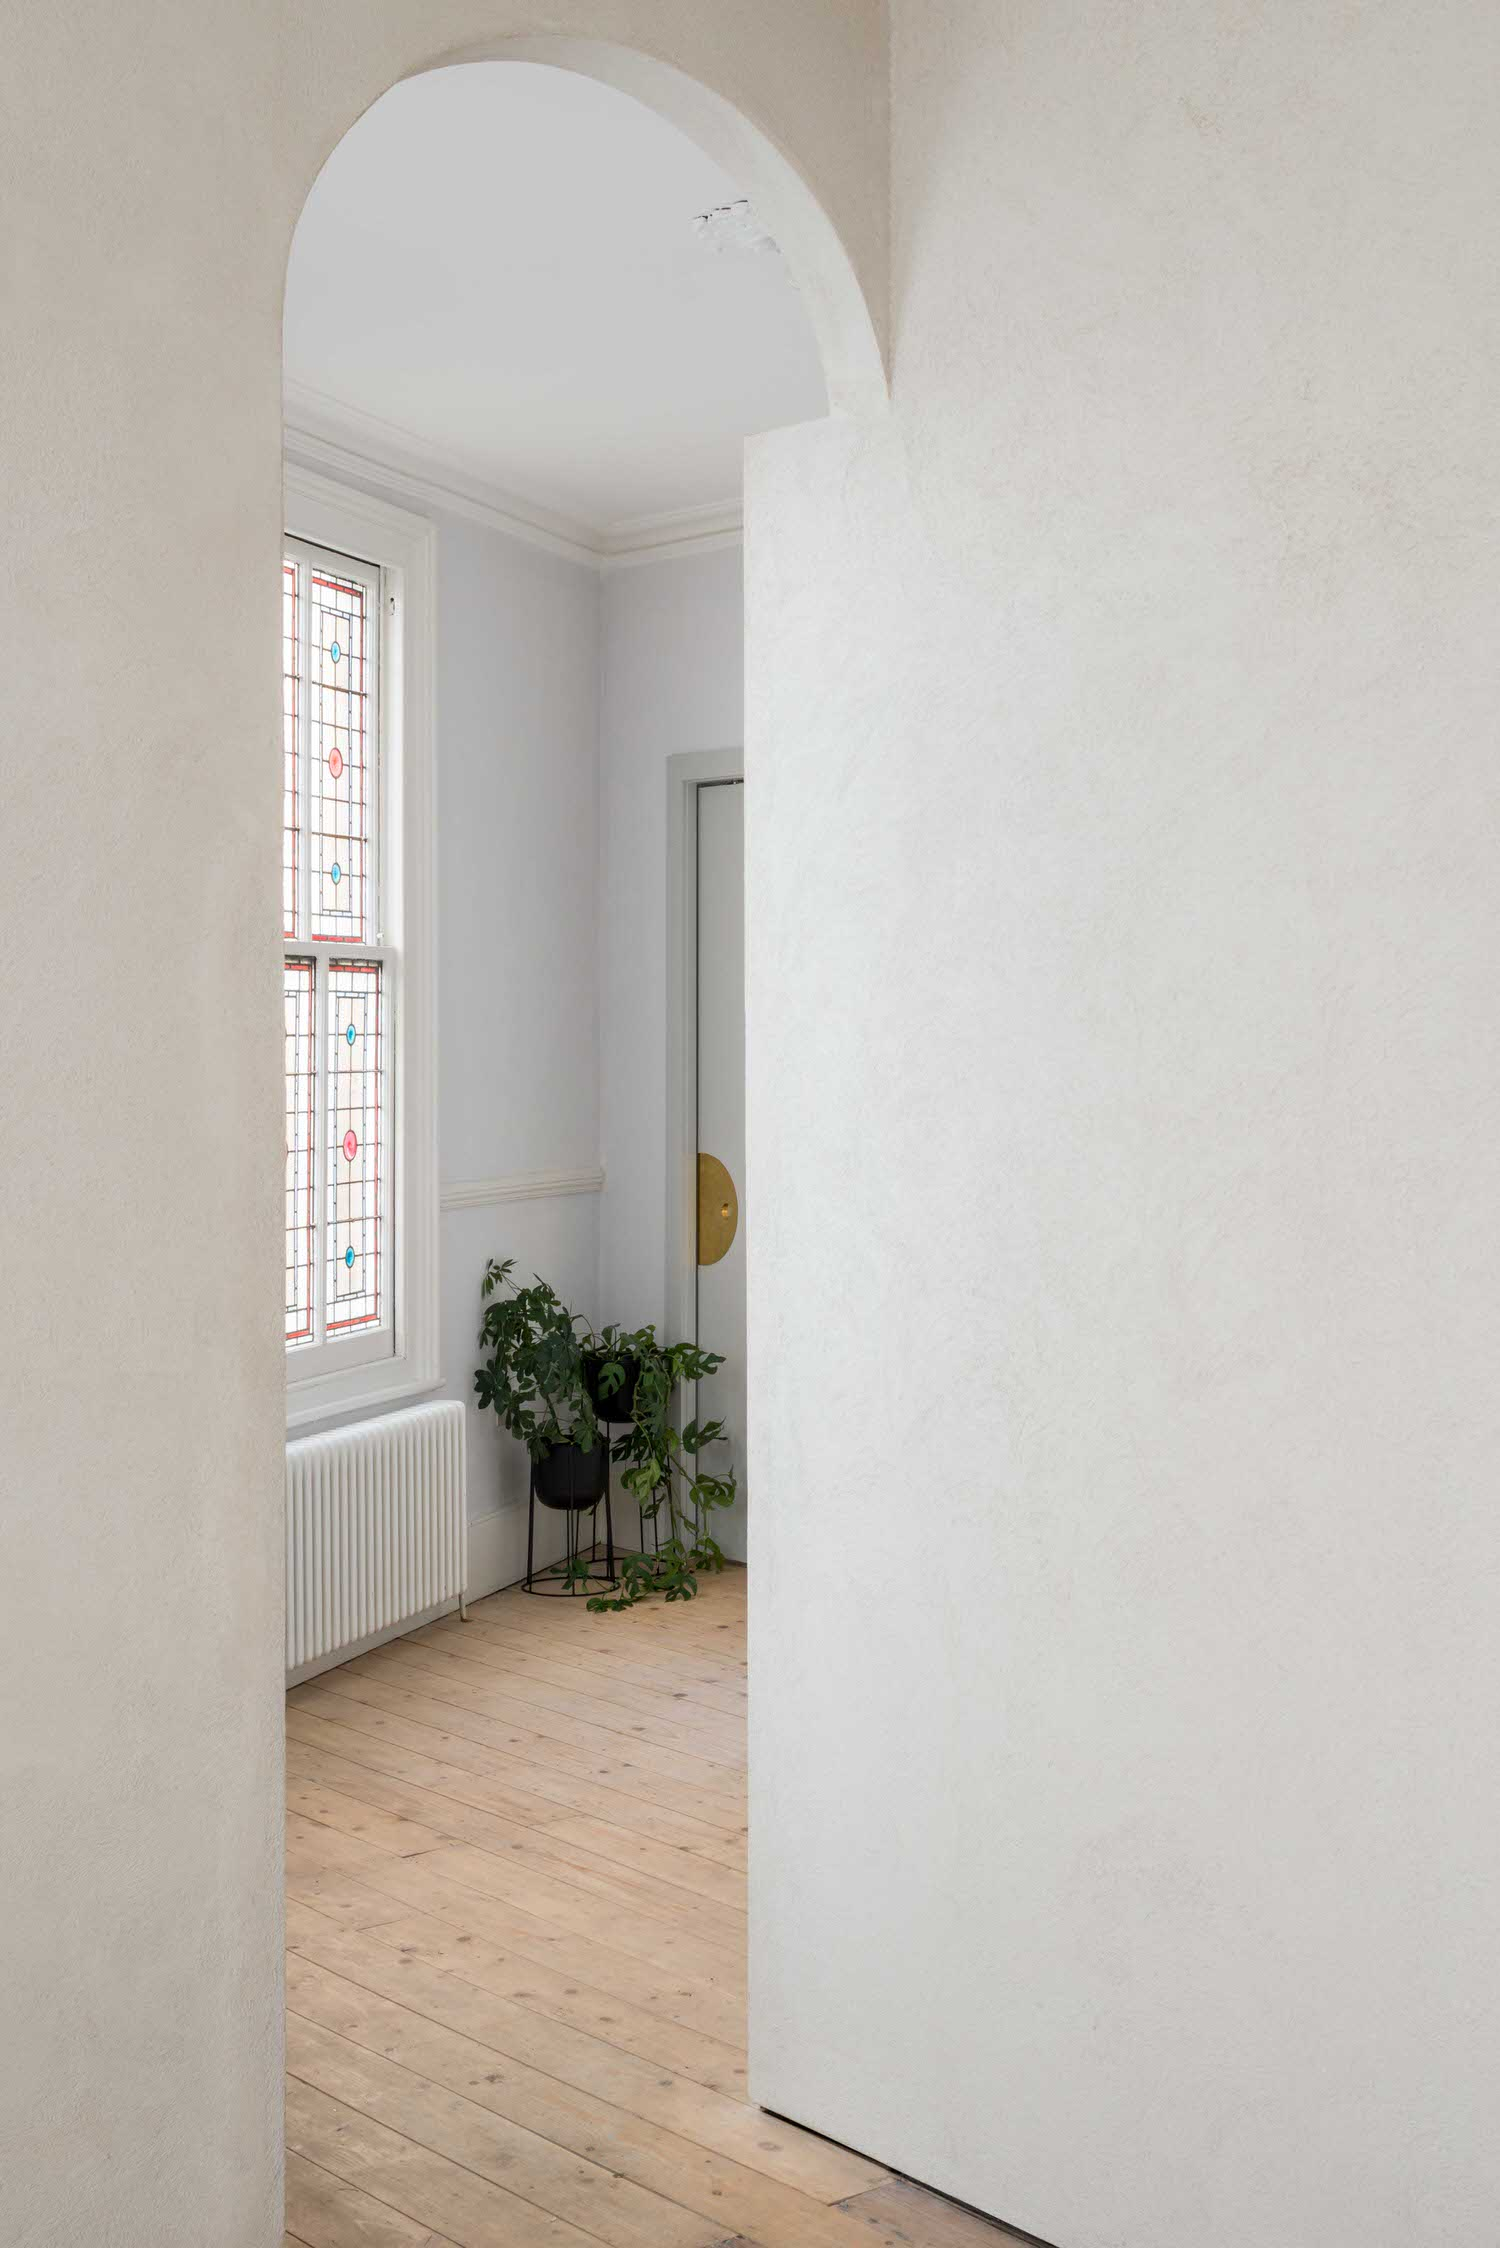 Studio Ben Allen House Recast London Residential Architecture Photo French+tye Yellowtrace 31